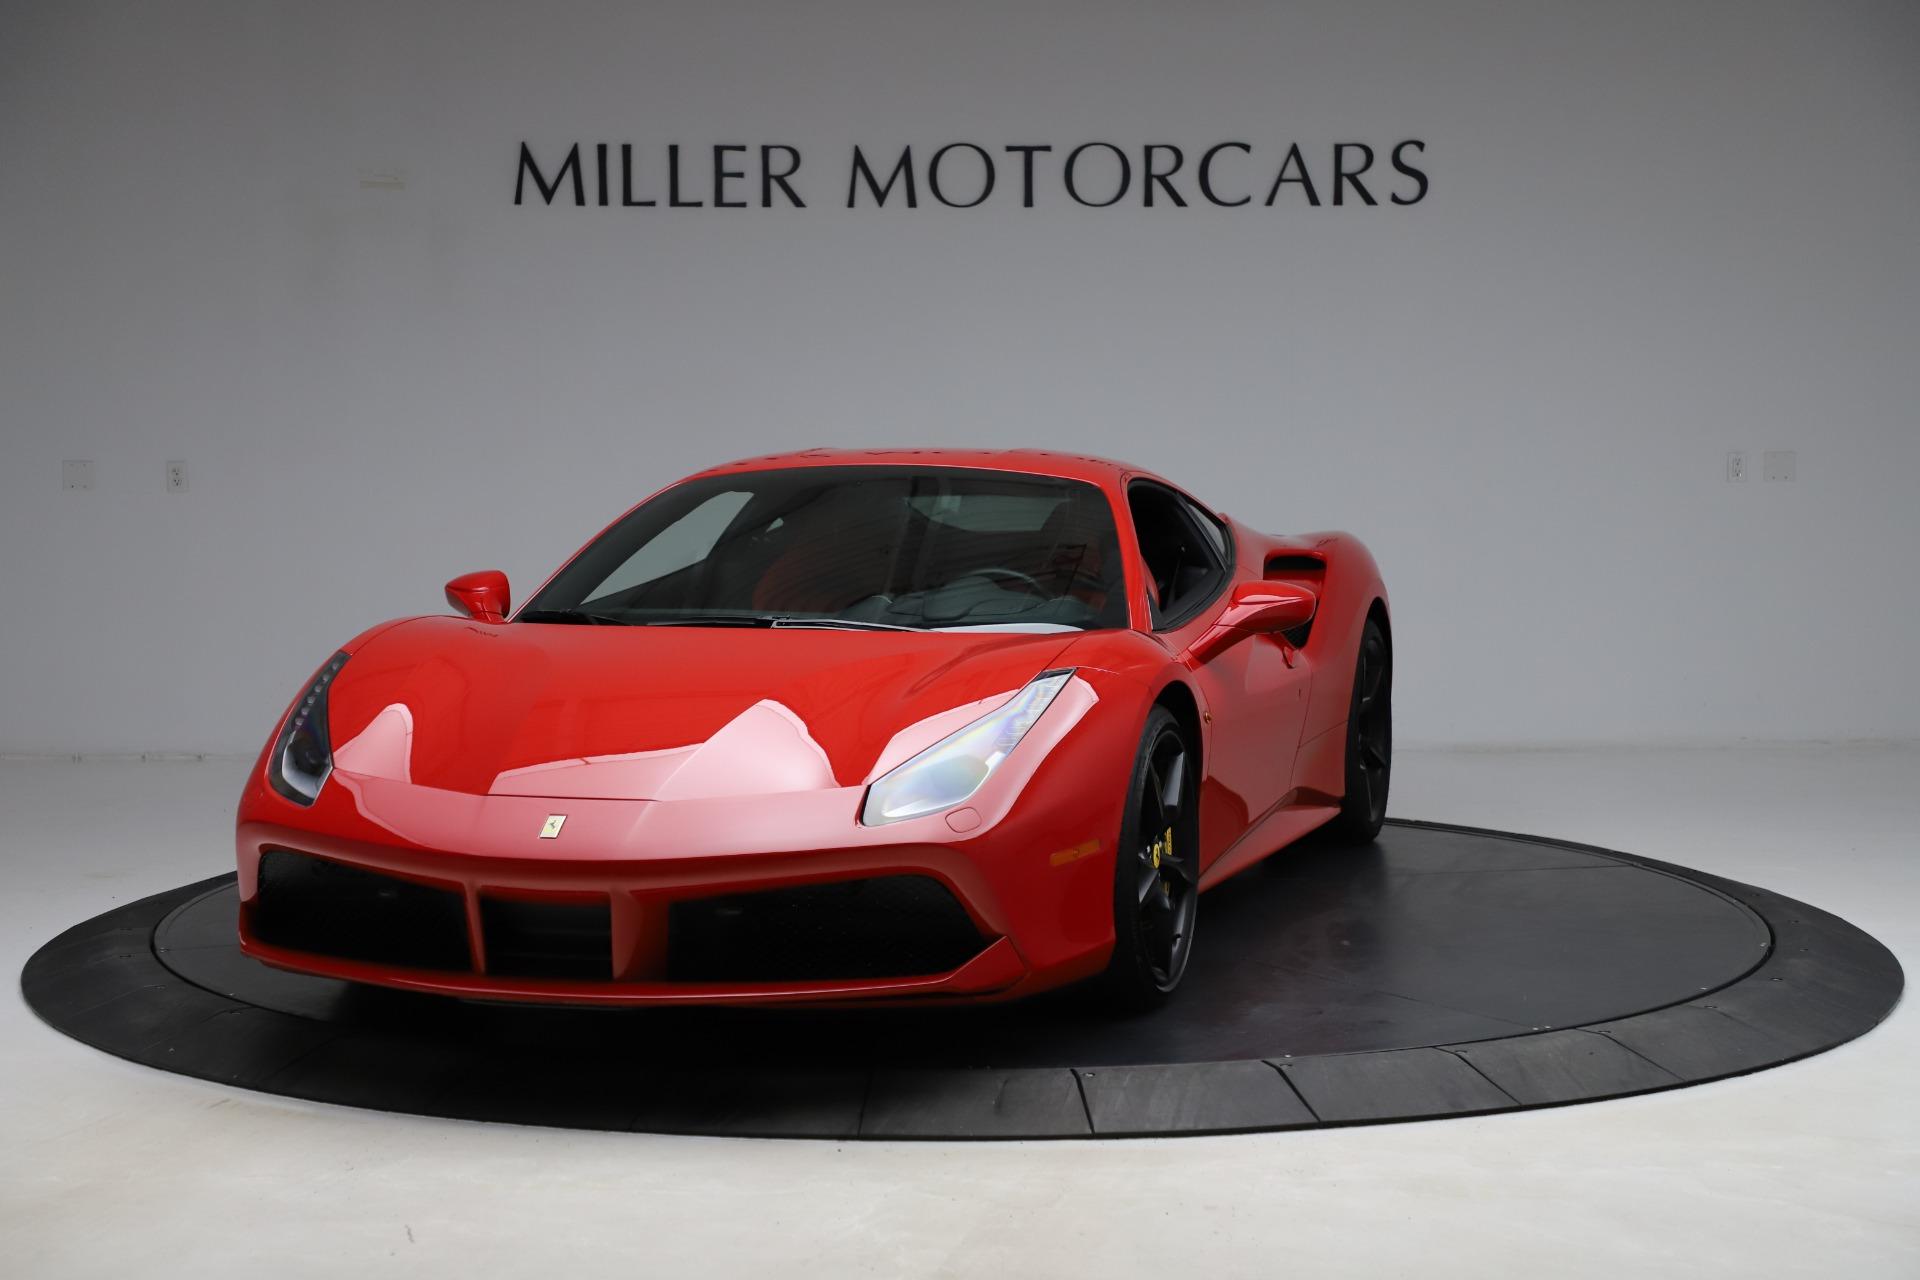 Used 2018 Ferrari 488 GTB for sale Sold at Alfa Romeo of Greenwich in Greenwich CT 06830 1